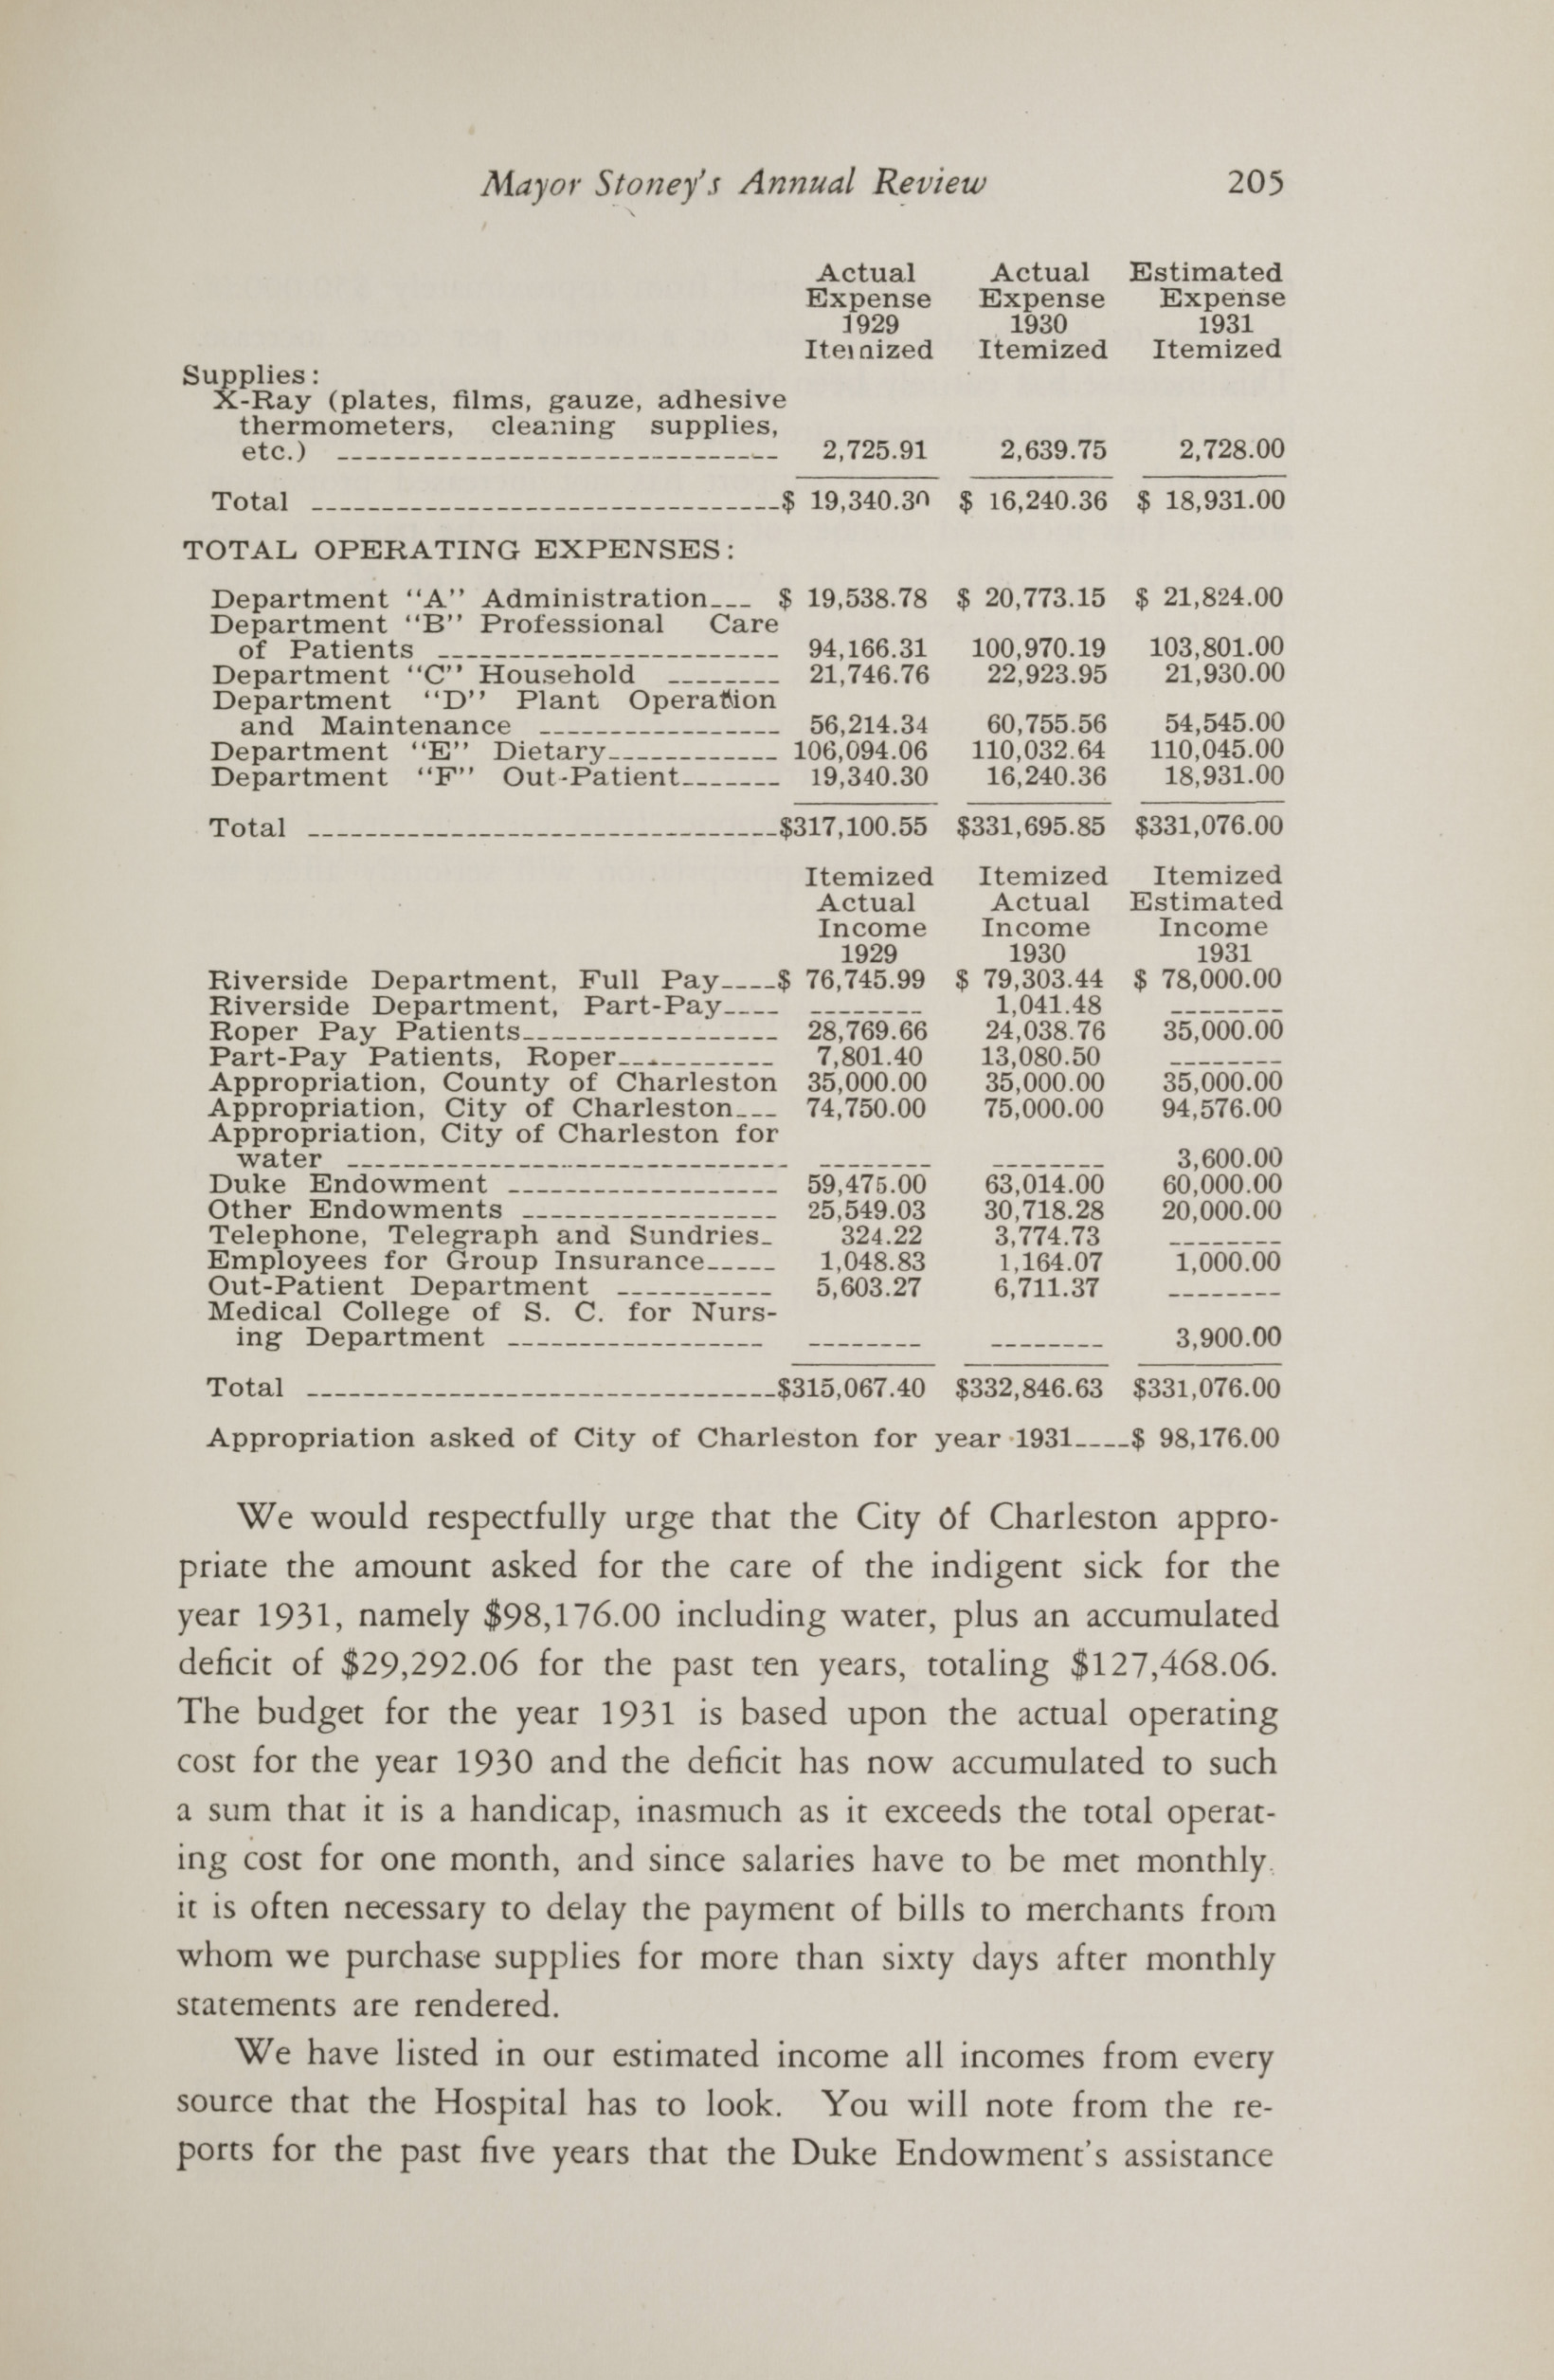 Charleston Yearbook, 1930, page 205